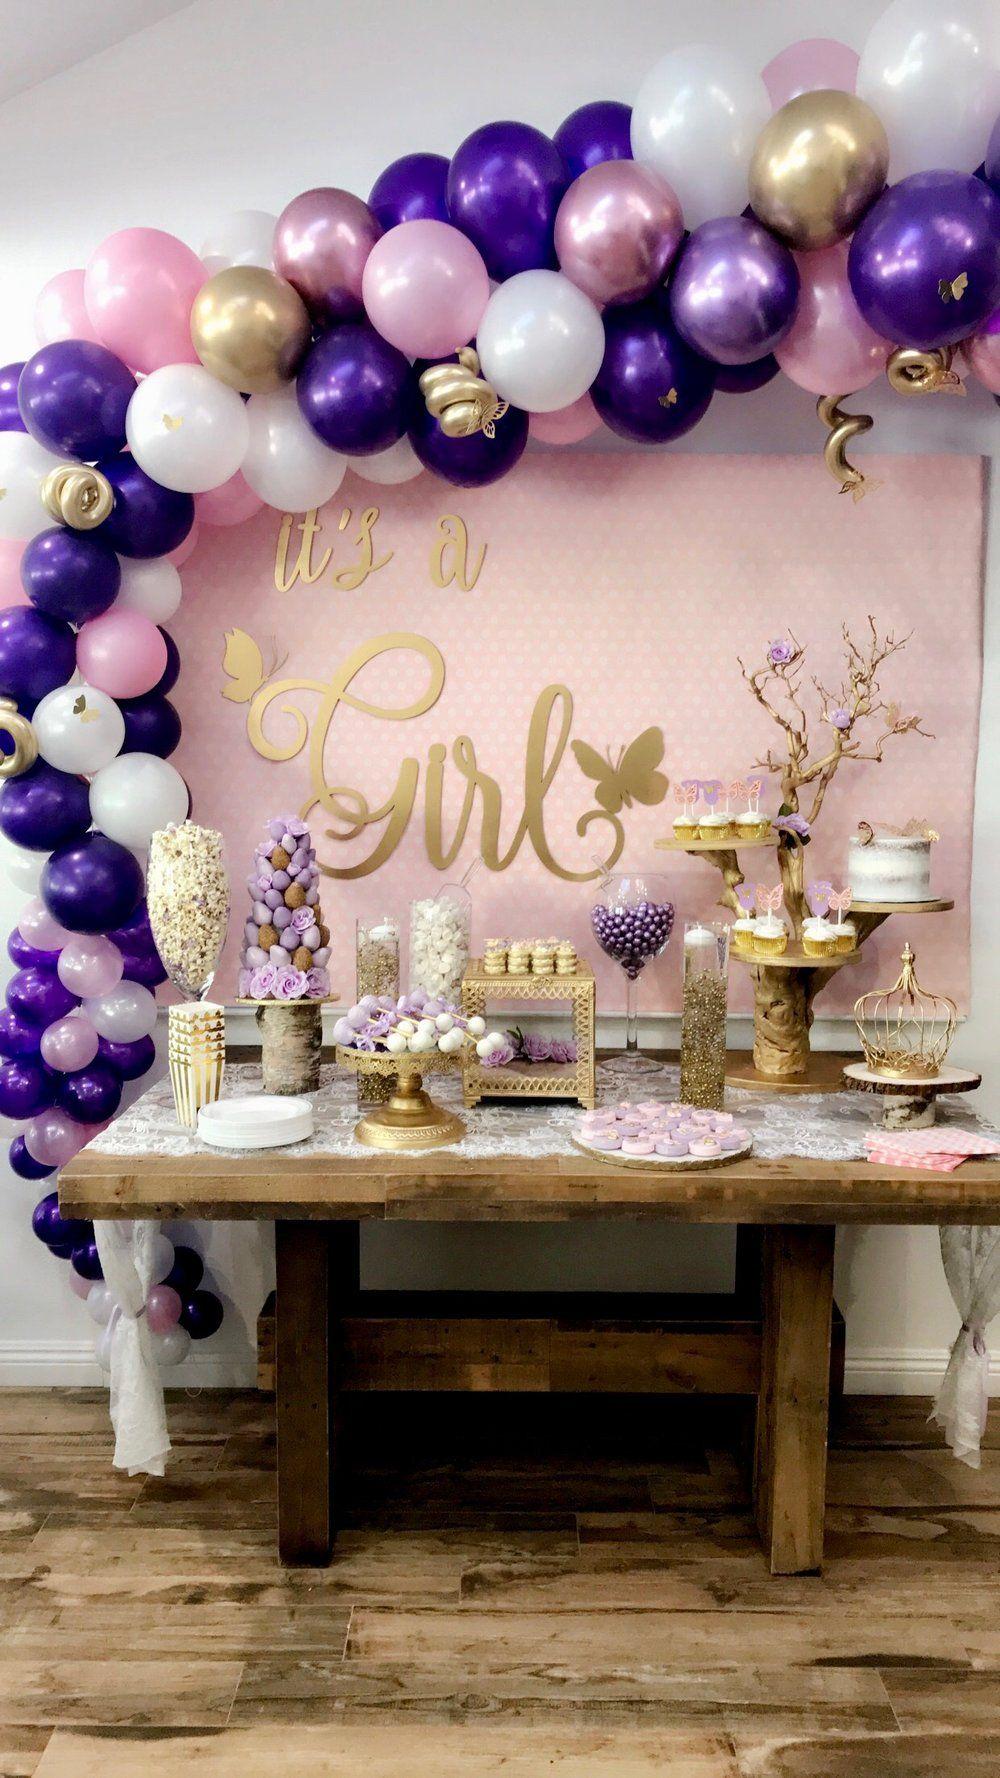 Purple Baby Shower Themes For Girls : purple, shower, themes, girls, Butterfly, Shower, Ideas-Butterfly, Shower-Butterfly-Its, Girl-www.SugarPartiesLA.com, Purple,, Shower,, Decorations